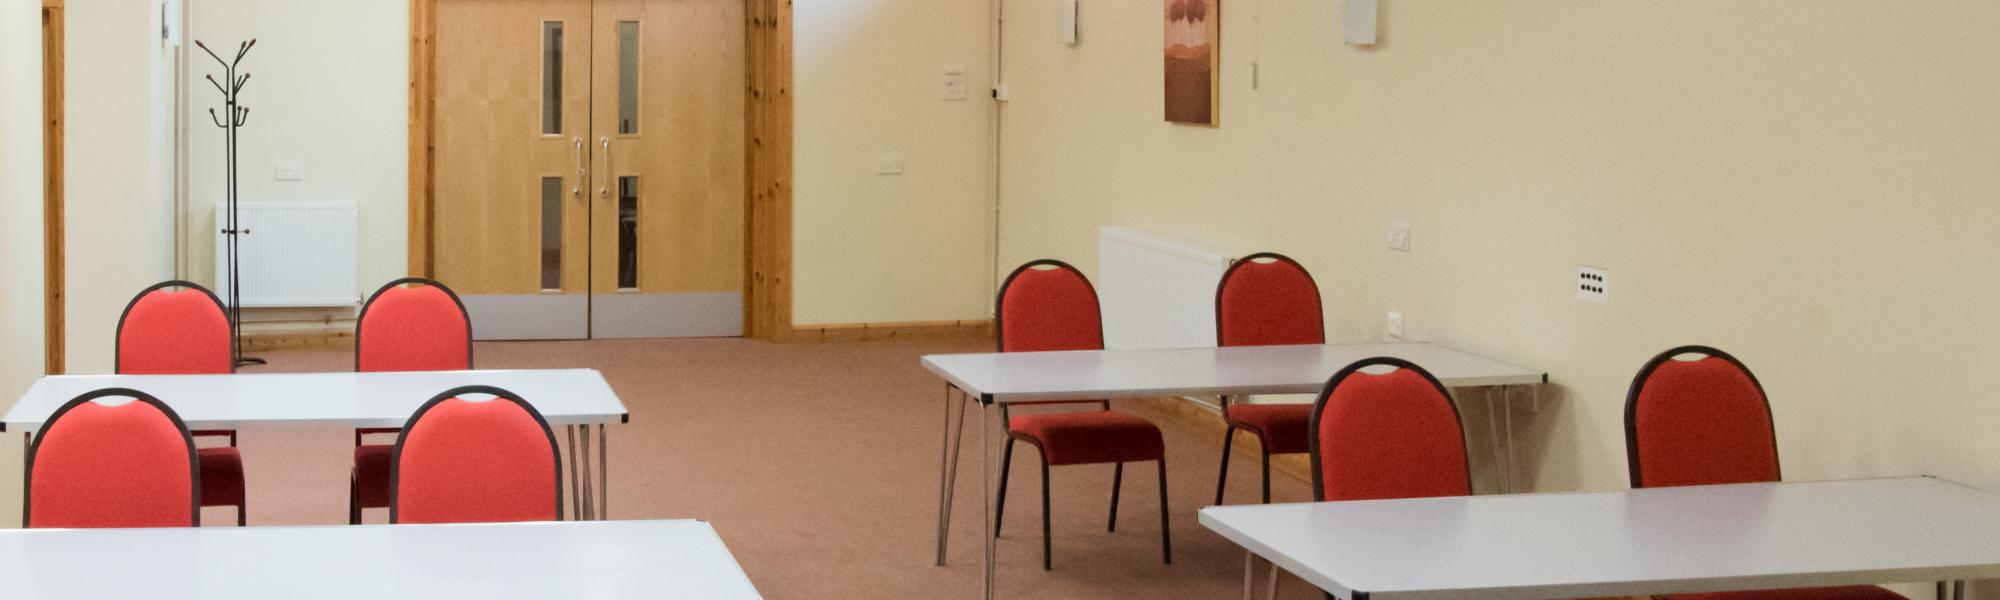 GNC MH classroom 4